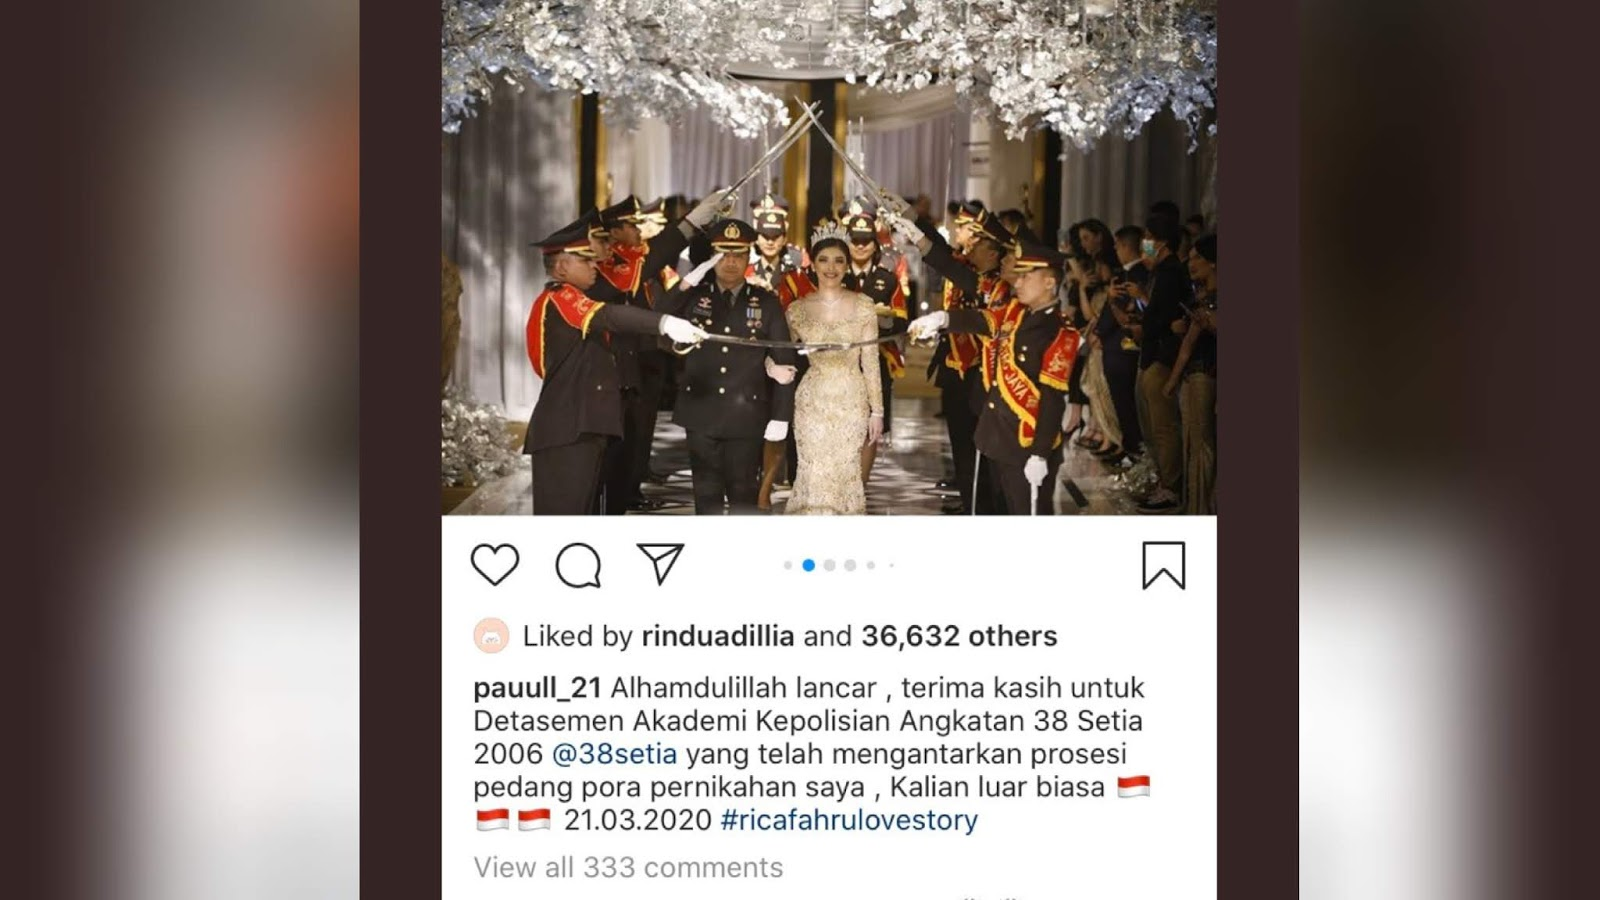 Viral Anggota Polisi Gelar Pernikahan Di Tengah Wabah Virus Corona Kumbanews Com